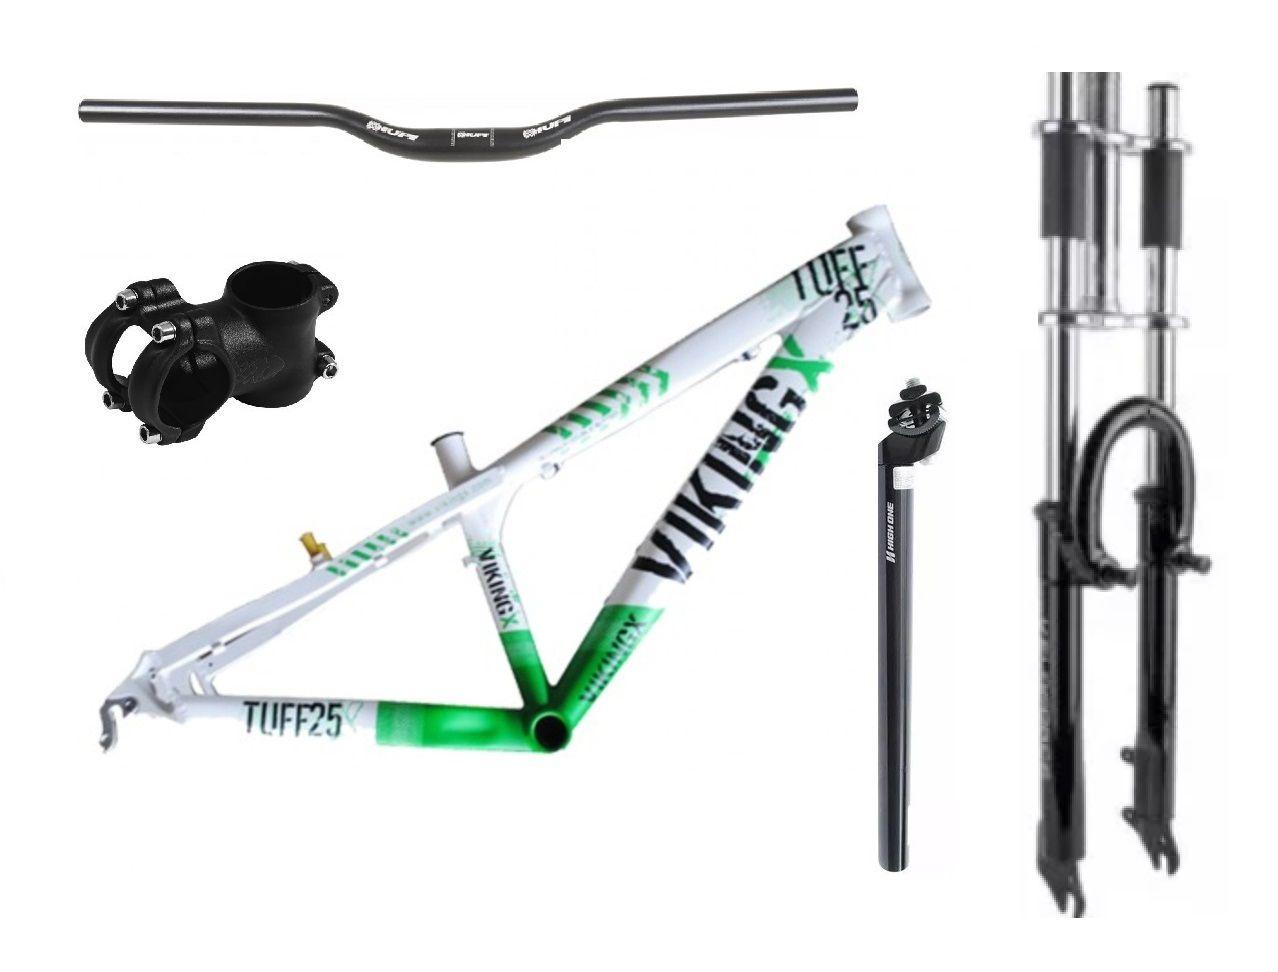 Kit Montagem Bicicleta Freeride Aro 26 Mtb Downhill